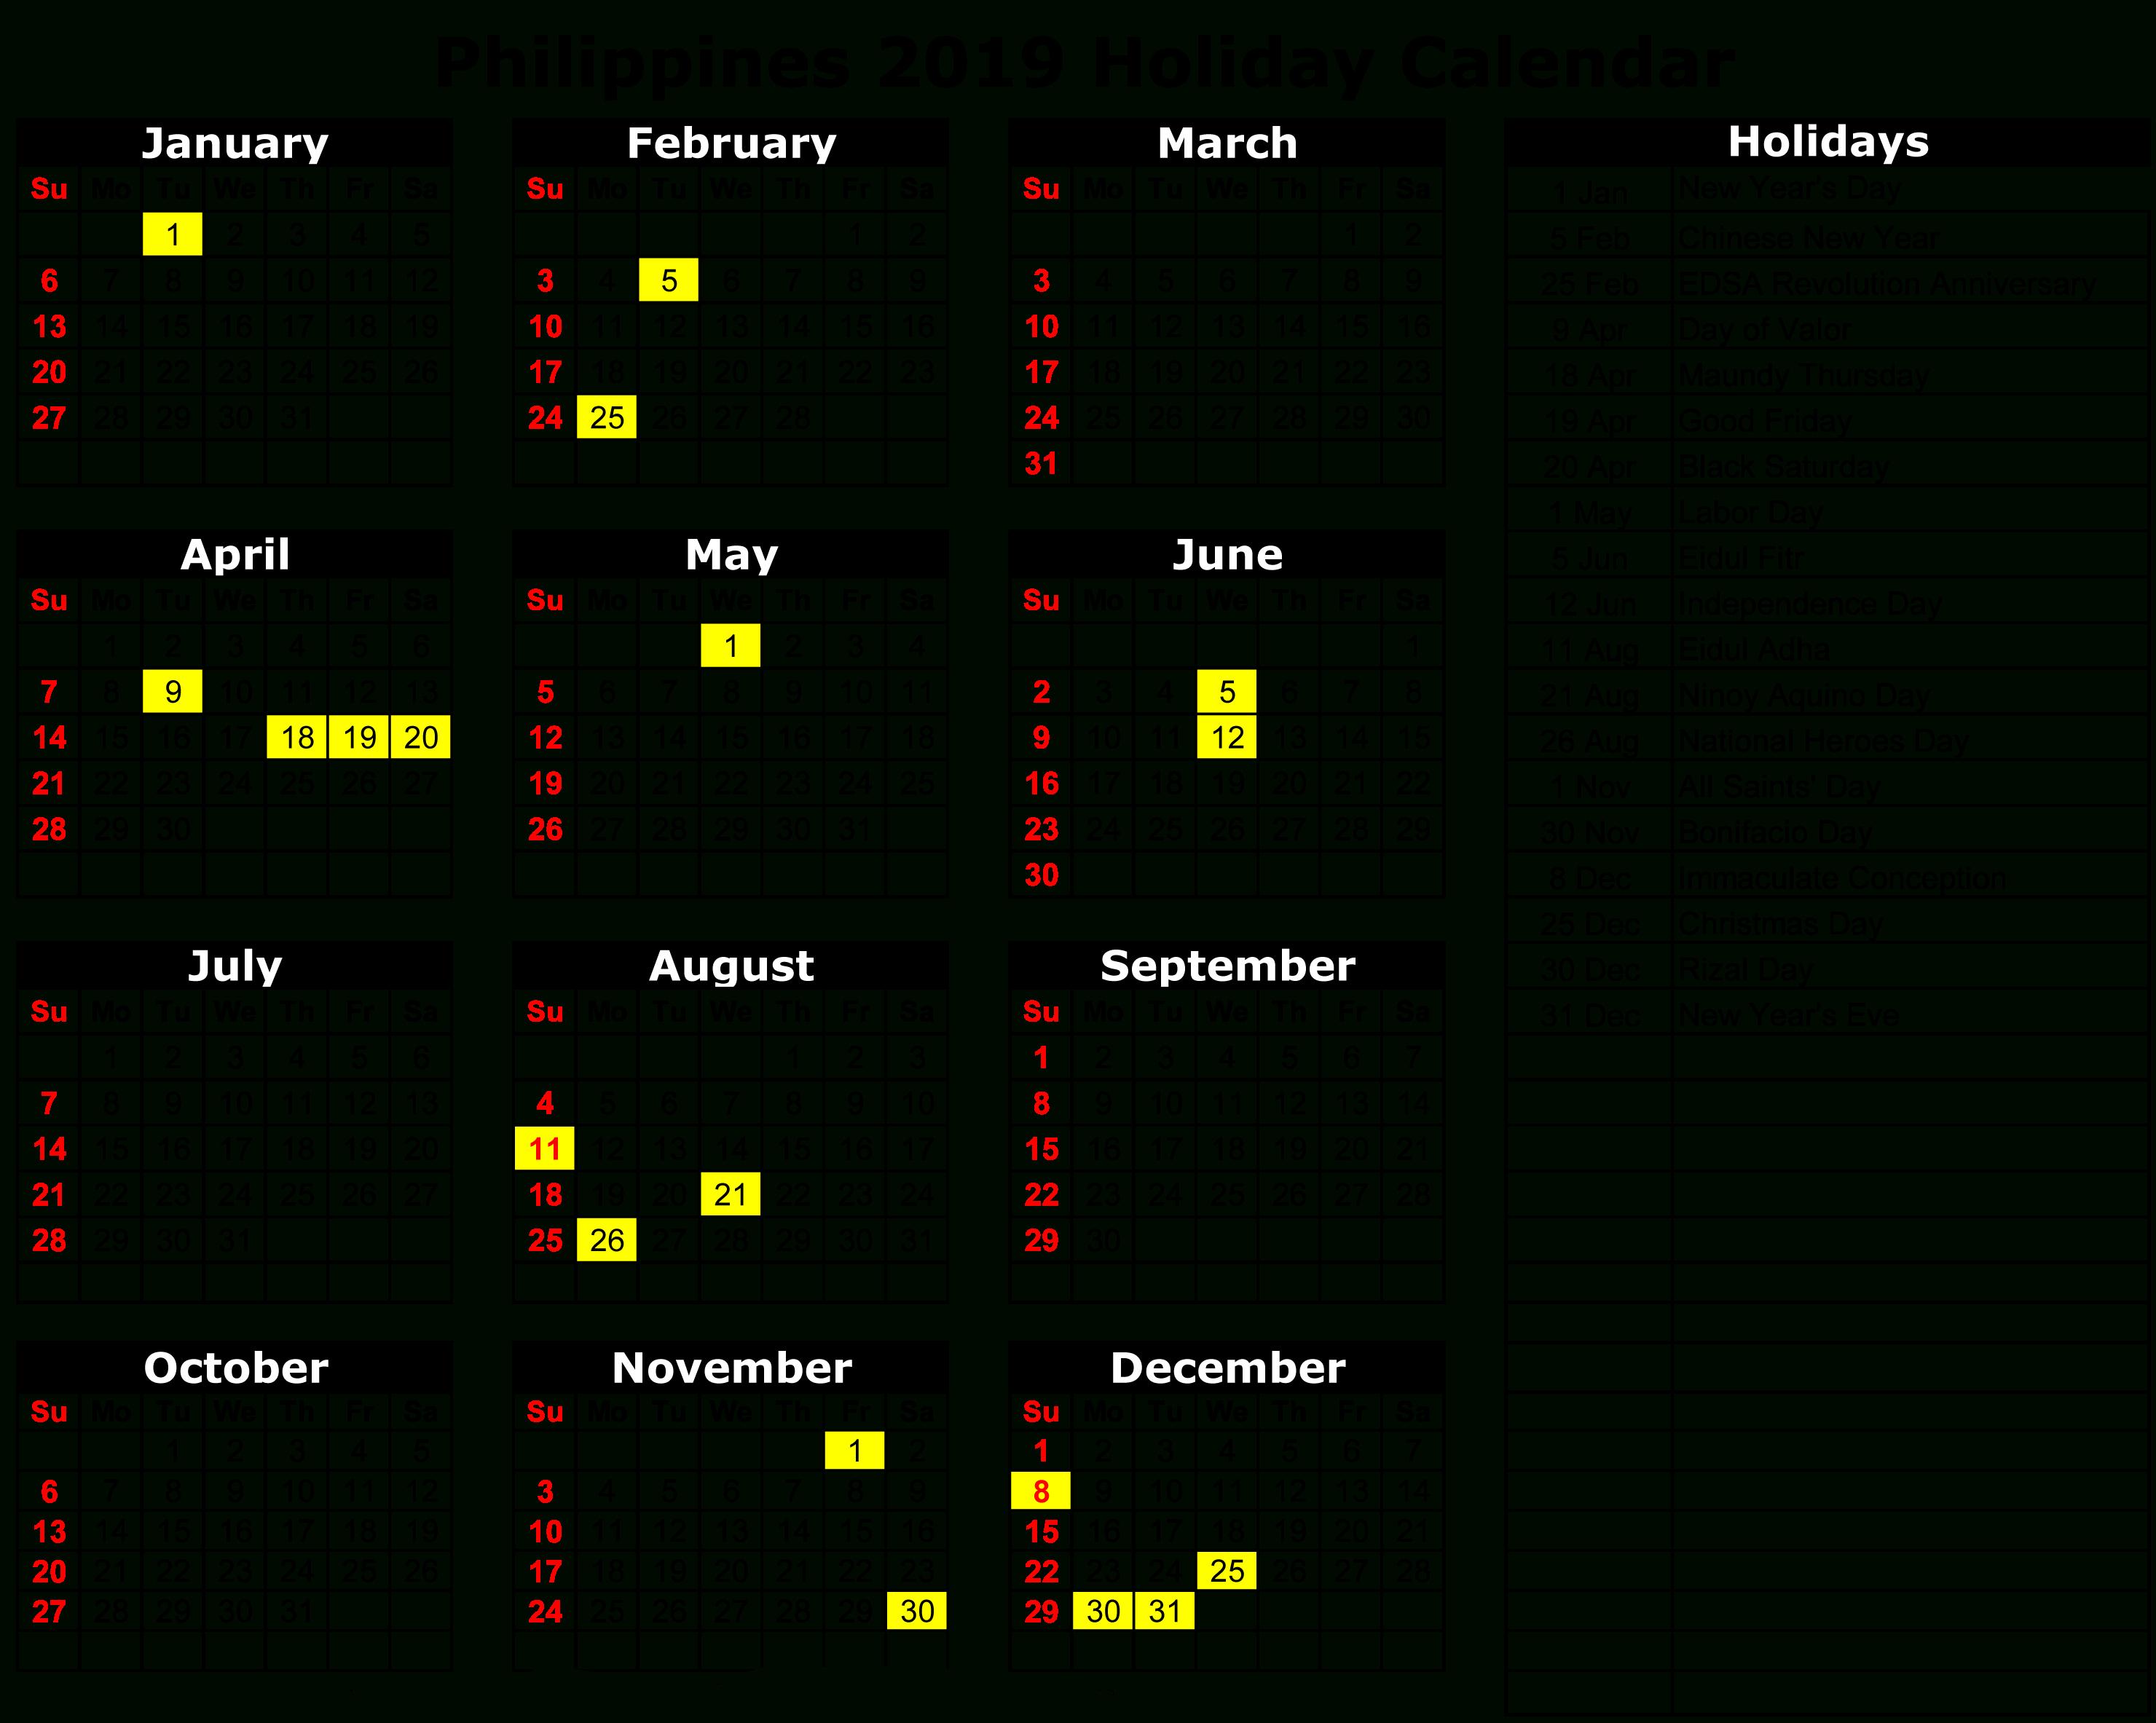 Philippines 2019 Holiday Calendar | Calendar 2019 | Holiday